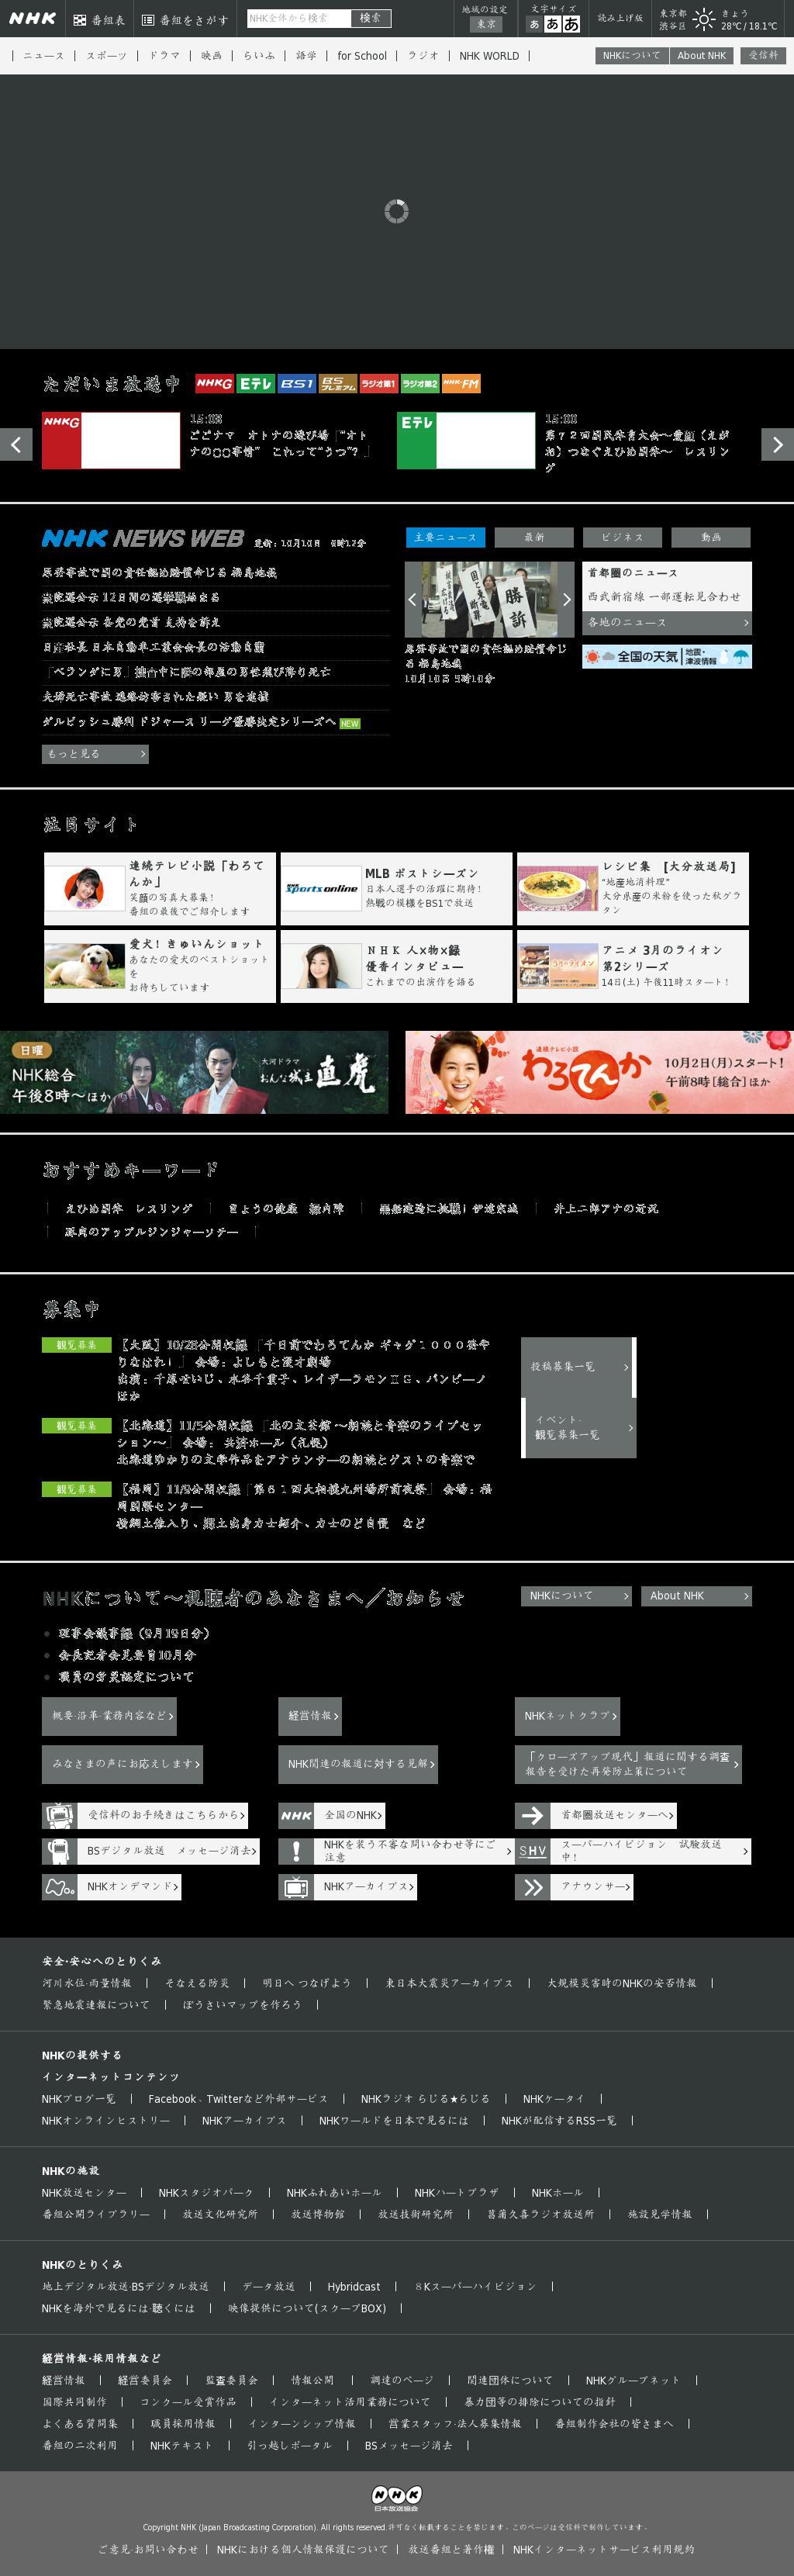 NHK Online at Tuesday Oct. 10, 2017, 6:28 a.m. UTC